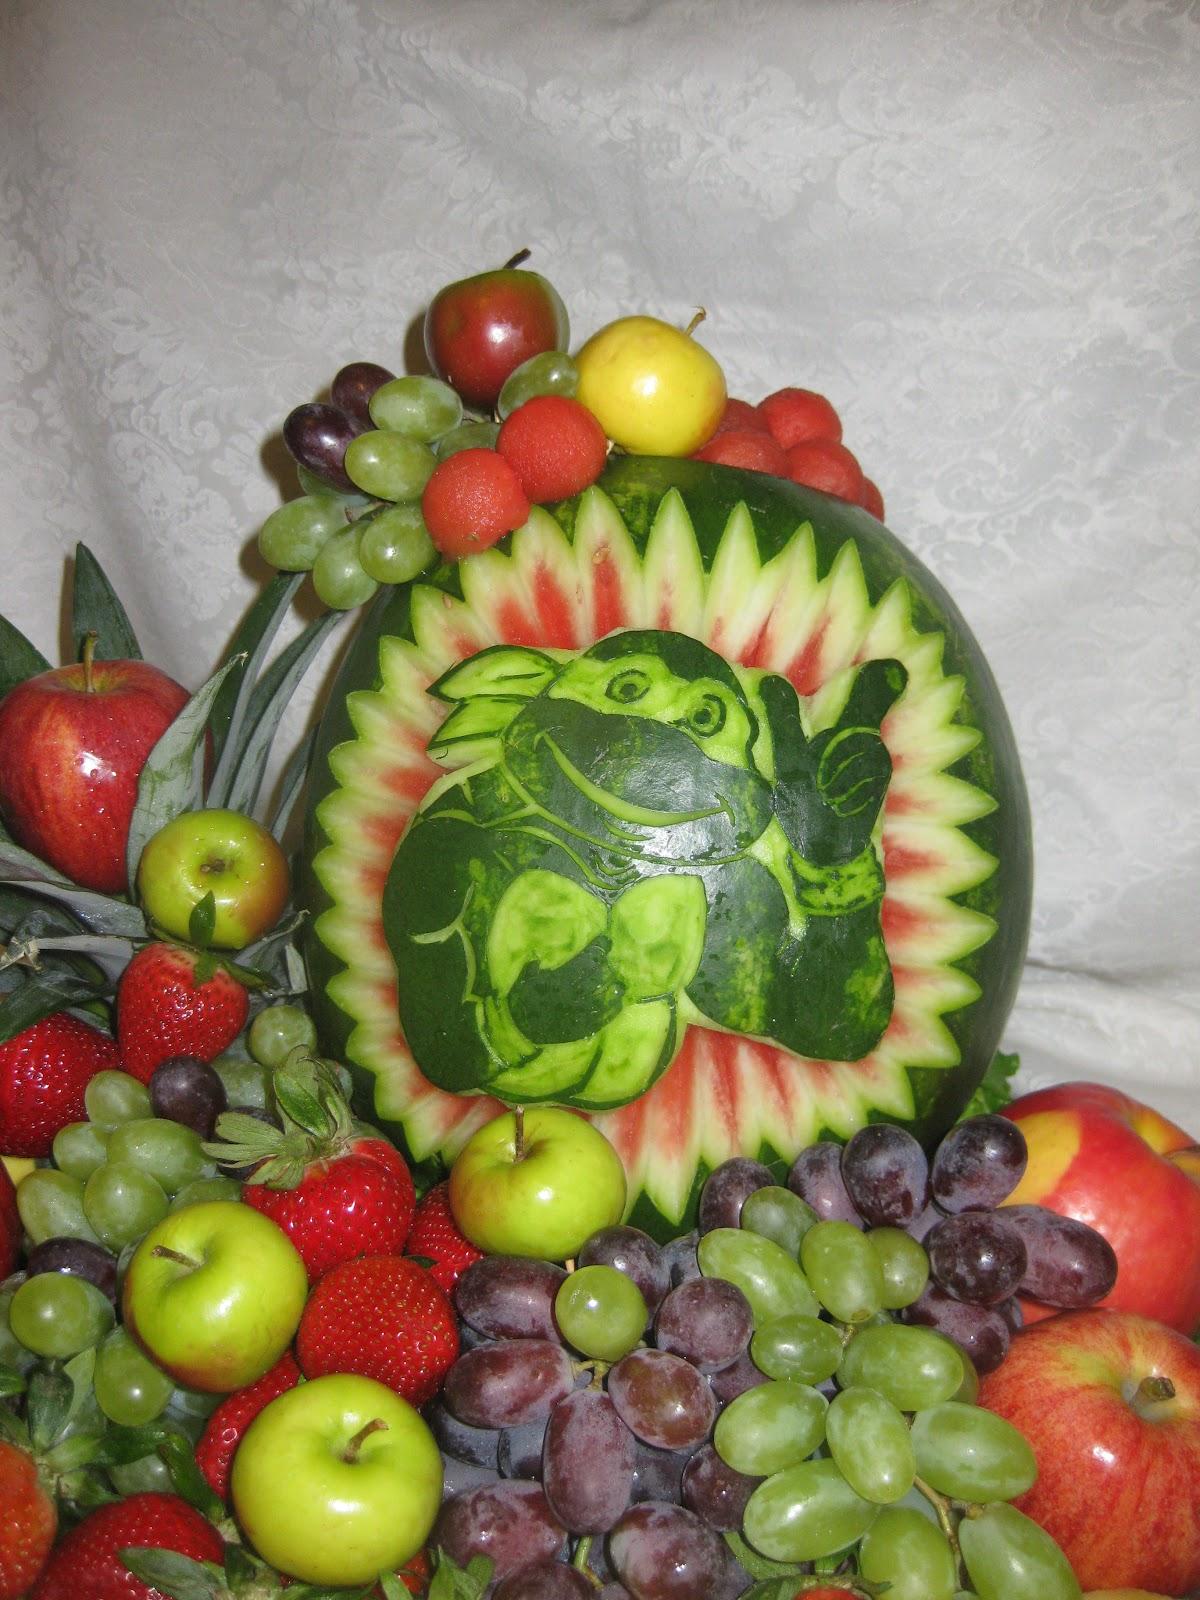 Fruit platter can say it ninja turtle